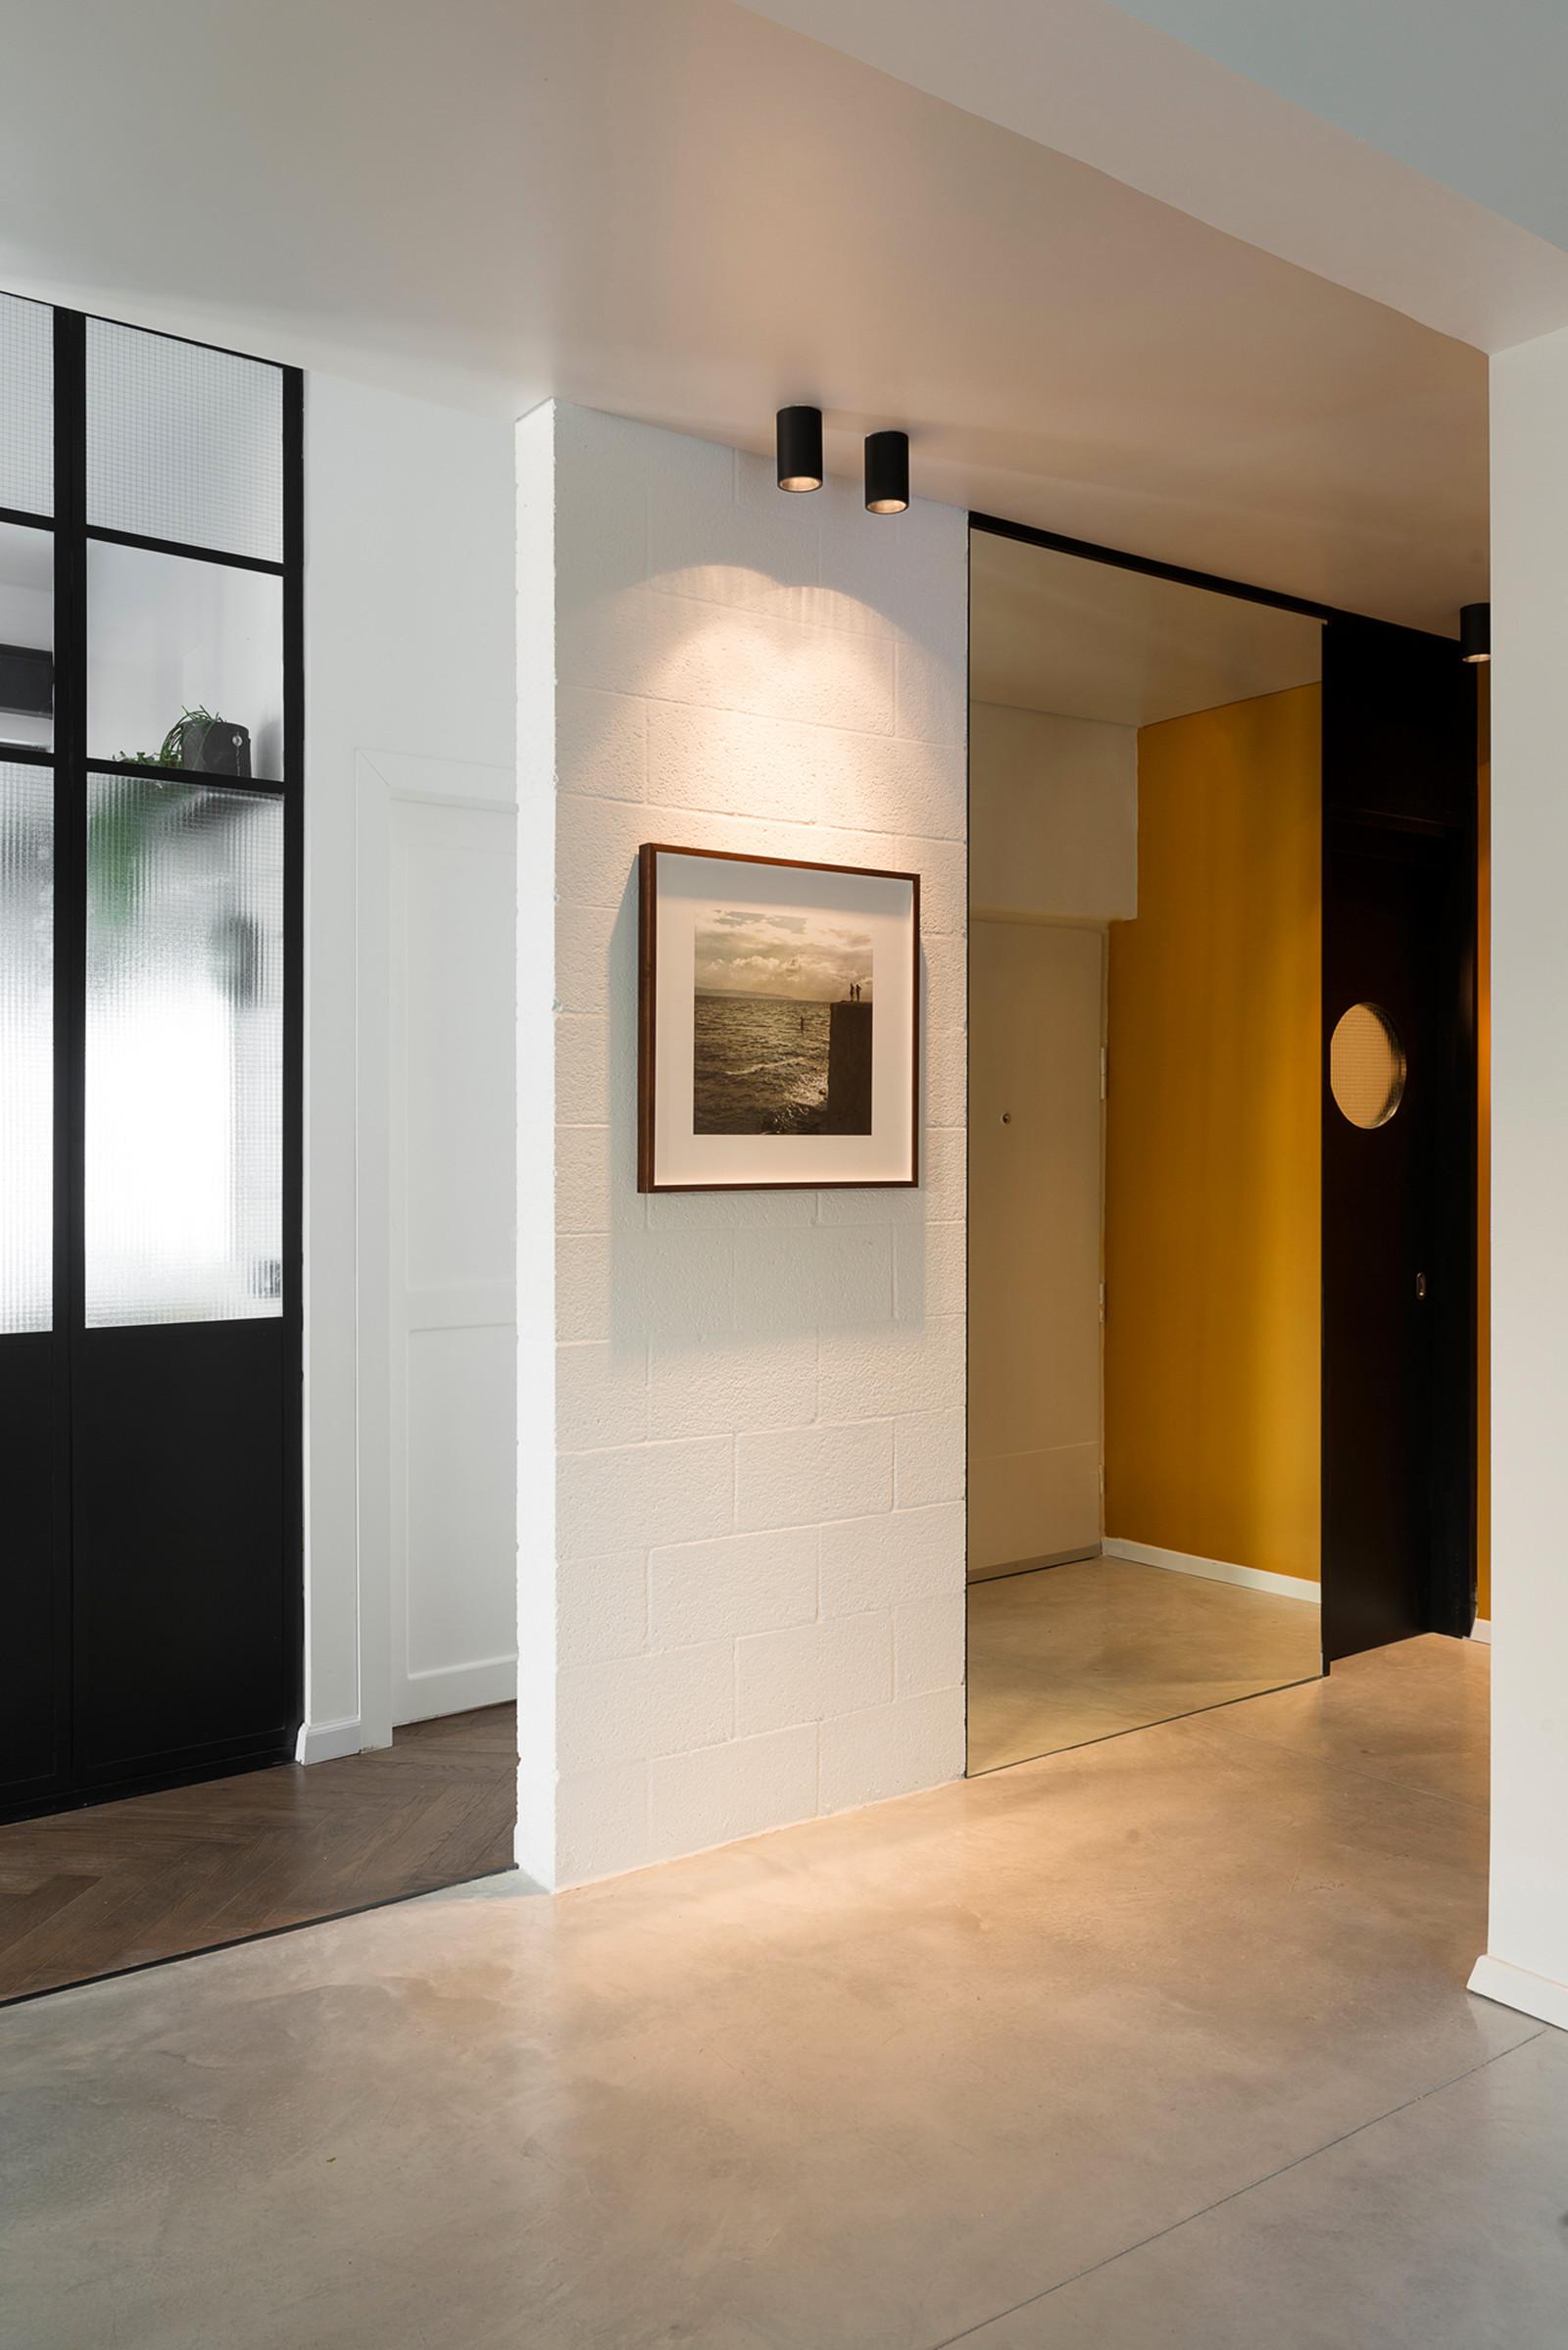 Apartment-renovation-just3ds.com-10